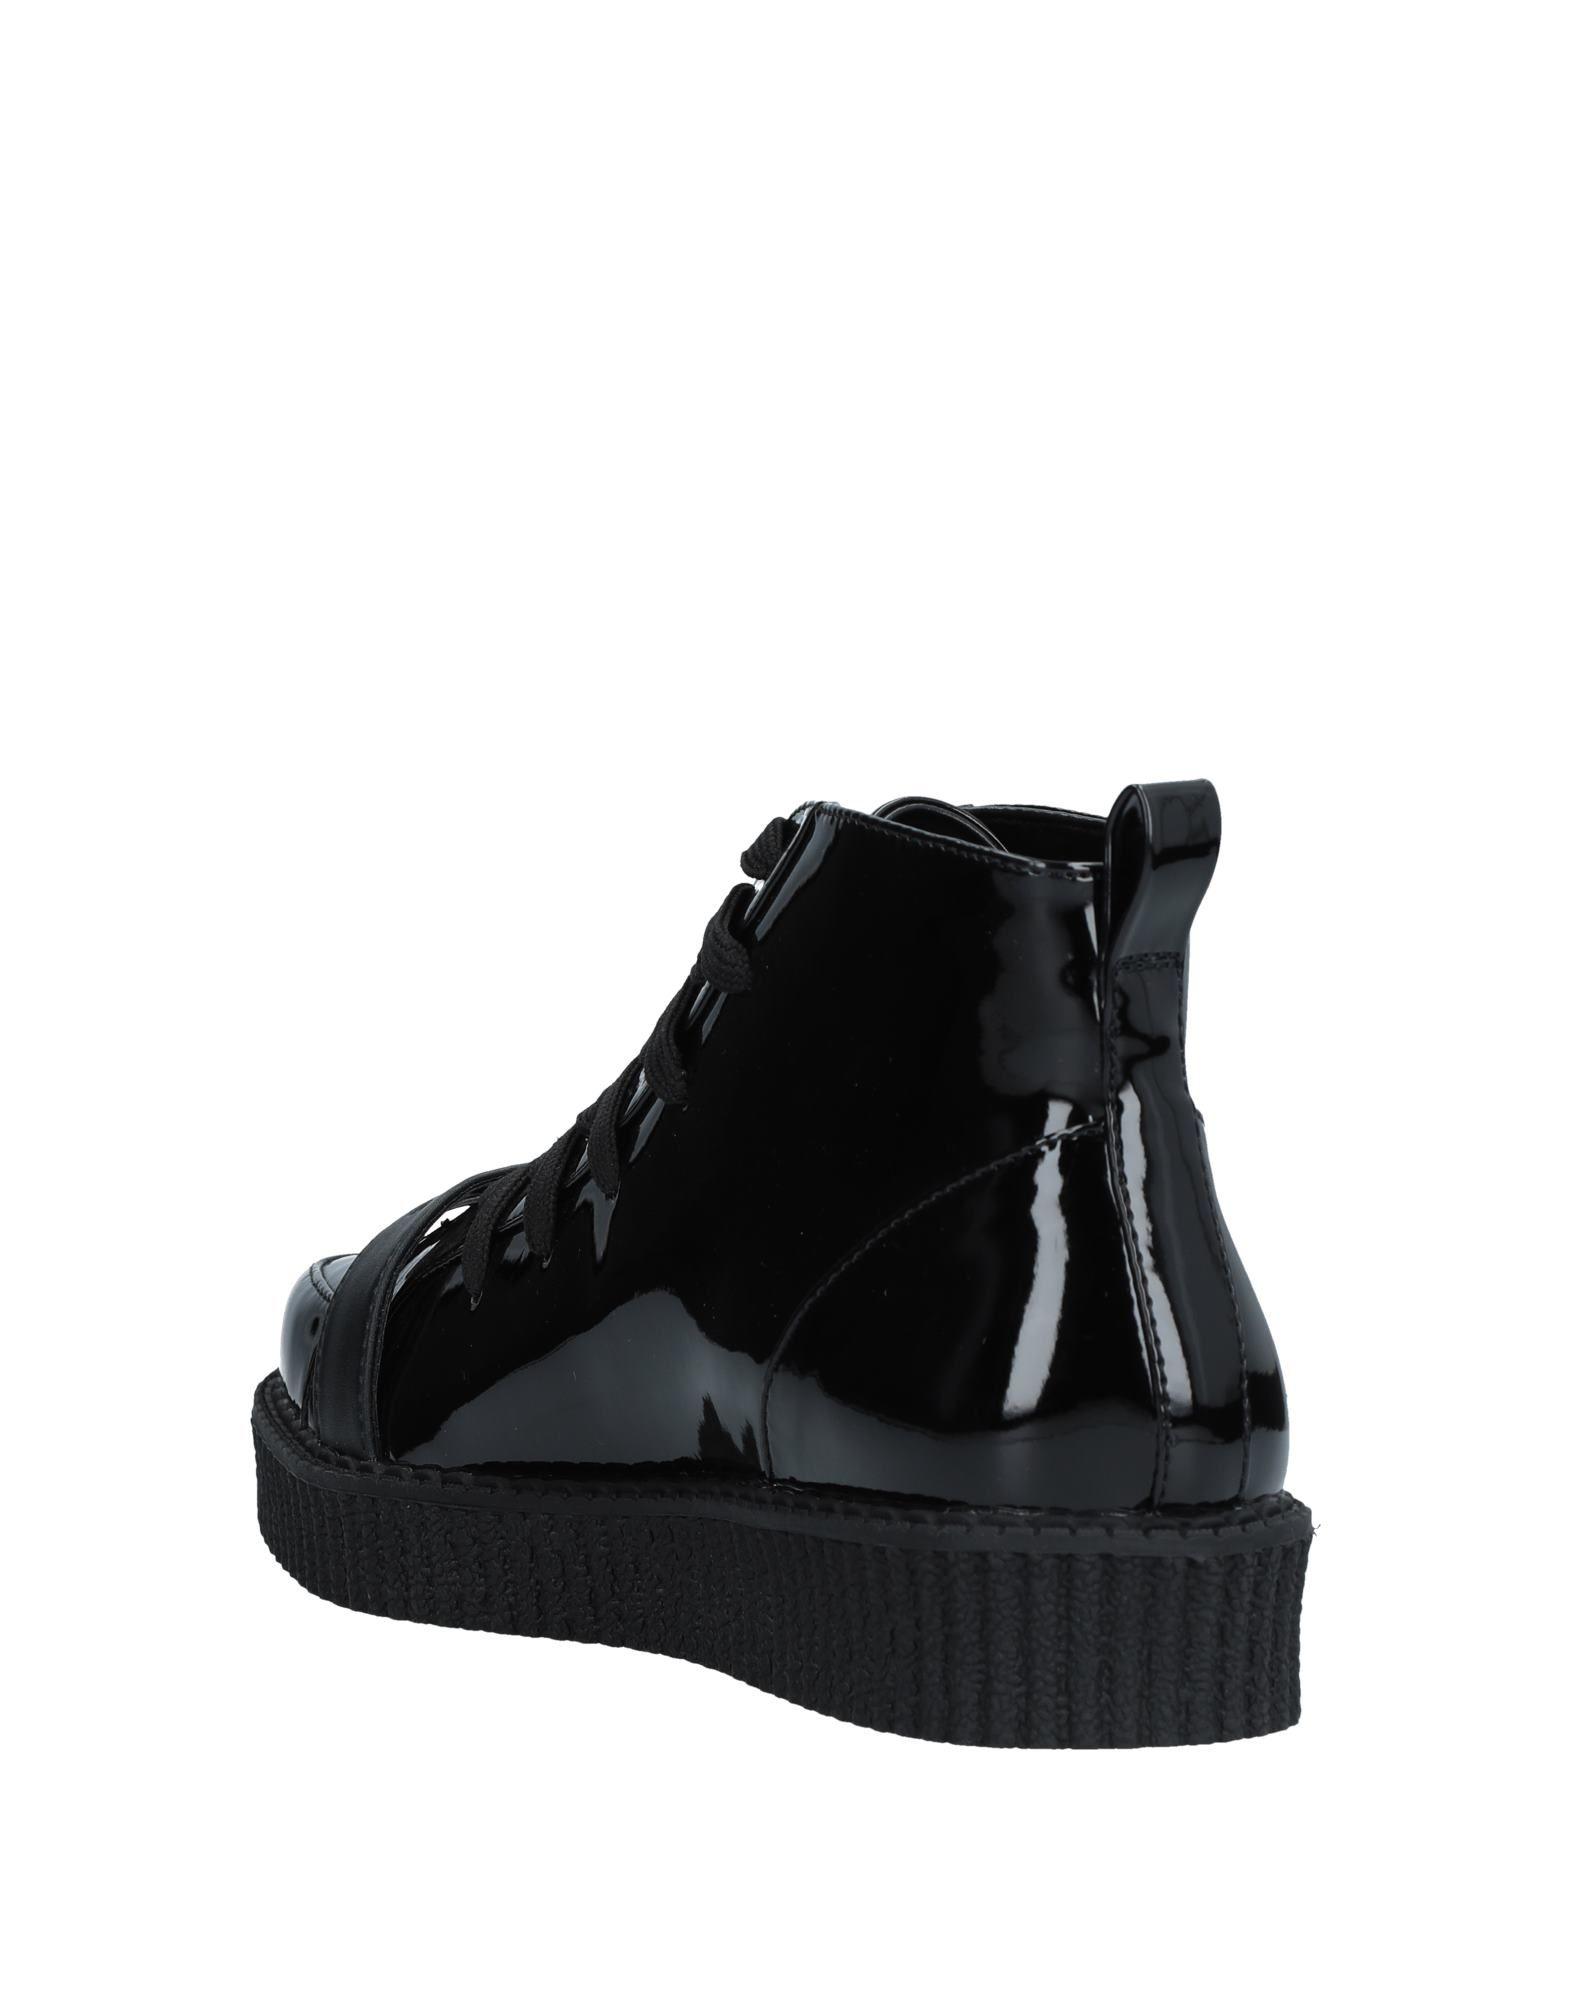 Stilvolle billige Schuhe Armani Jeans Sneakers Damen  11537680JQ